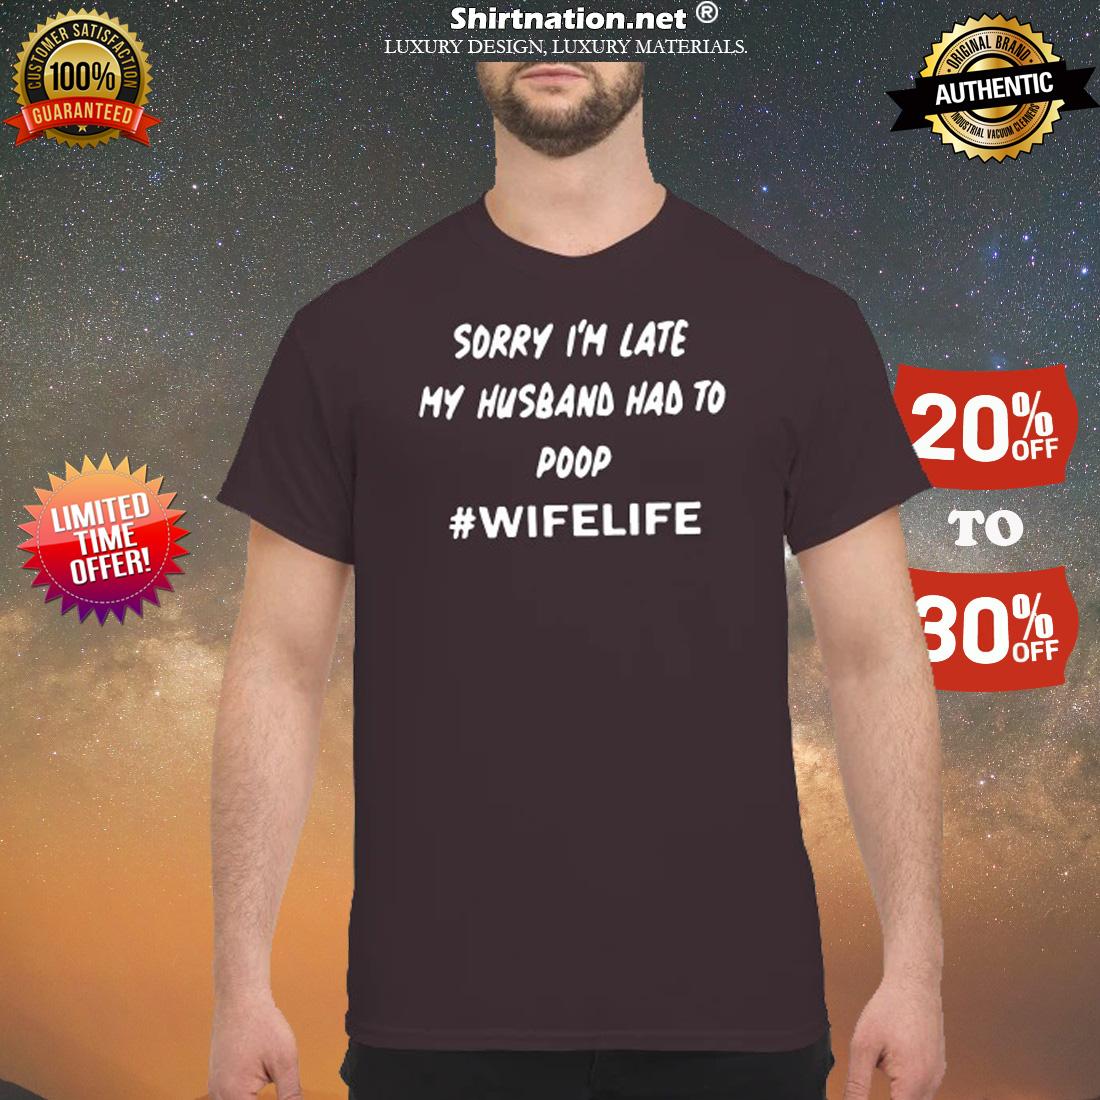 Sorry I'm late my husband had to poop wifelife shirt